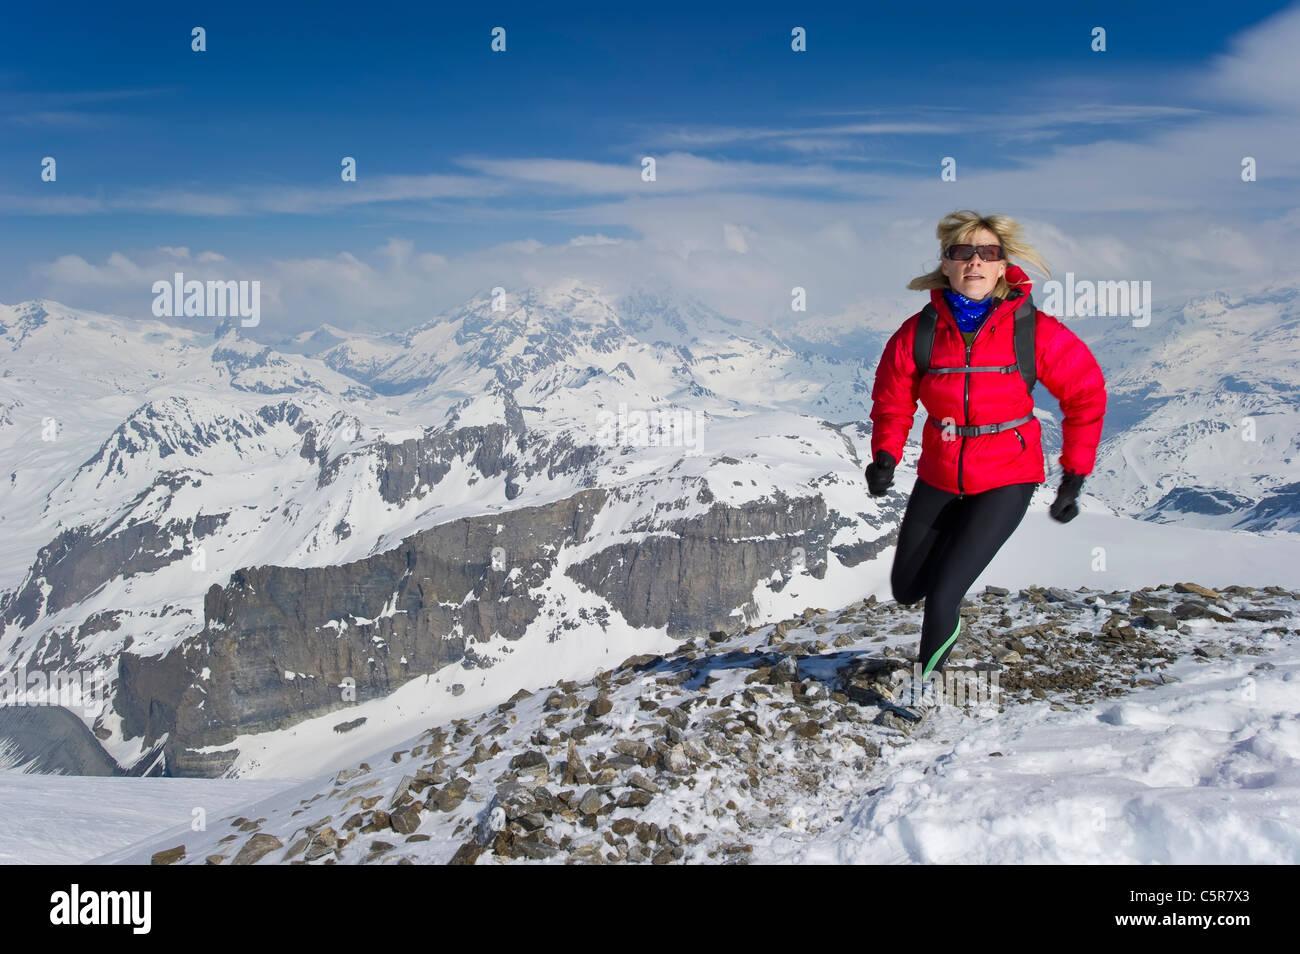 Frau Joggen über hohen schneebedeckten Gipfeln. Stockbild